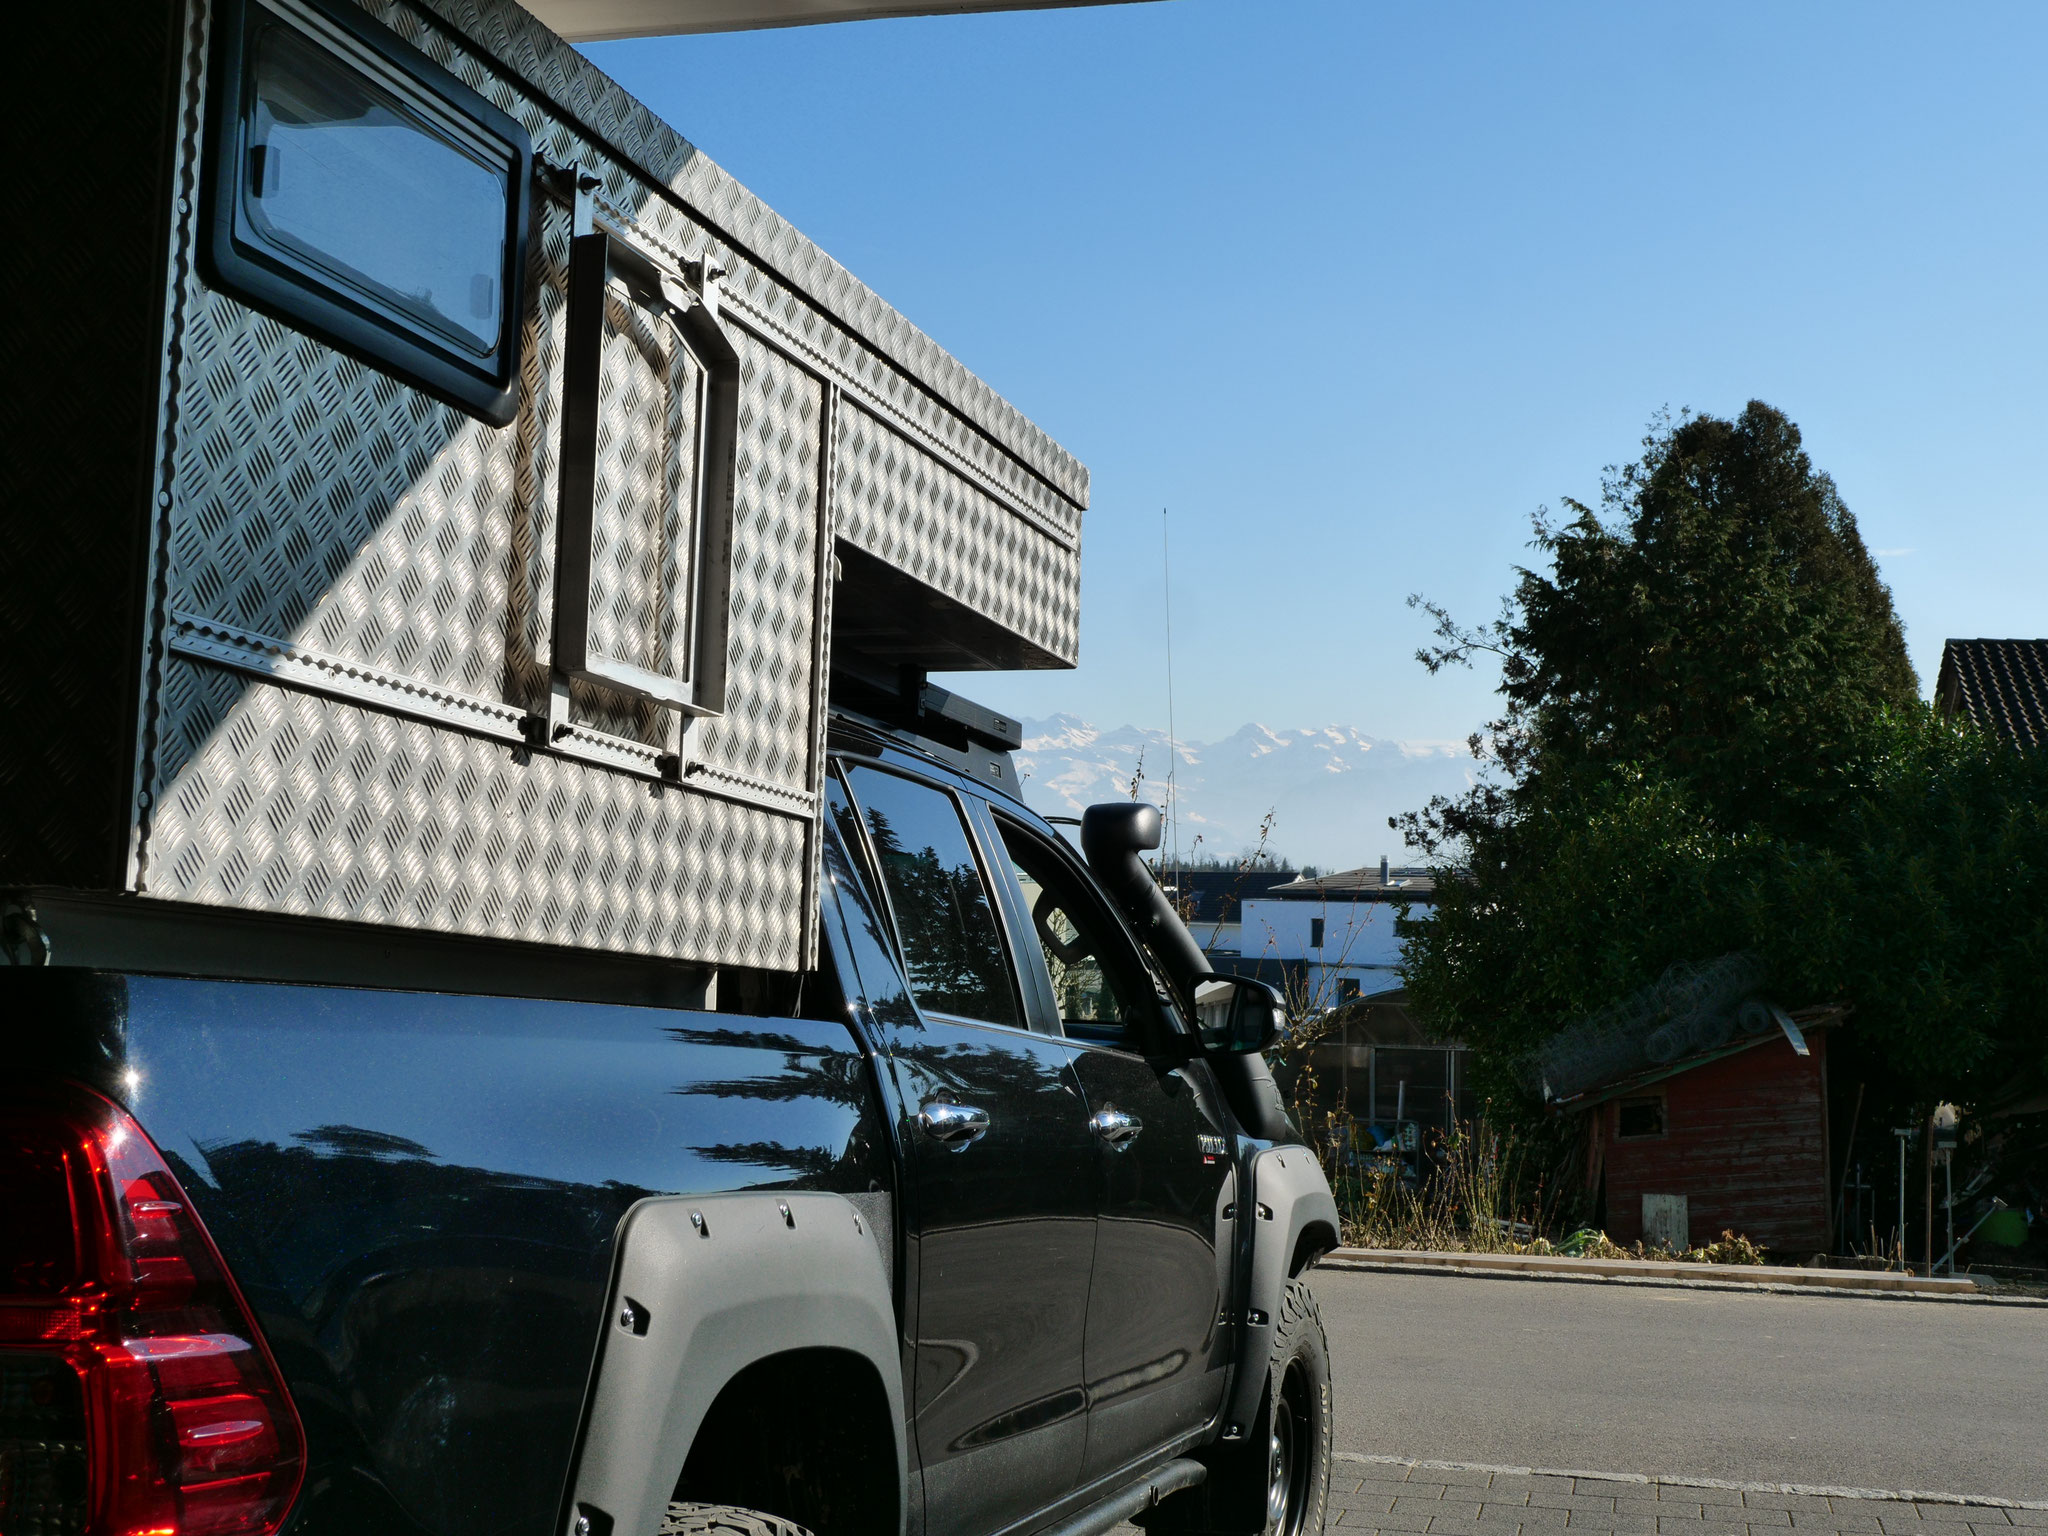 "Nestle Toyota Hilux Revo 2017 2.4 #ProjektBlackwolf  truckcamper Wohnkabine 4x4 ARB Fahrwerk Frontrunner Rocksliders Roofrack Rival skidplate  bfgoodrich 285/70R17 33"" Tires TJM Sknorkel Exkab 1 offroad Tacoma expedition overland wolf78-overland.ch"